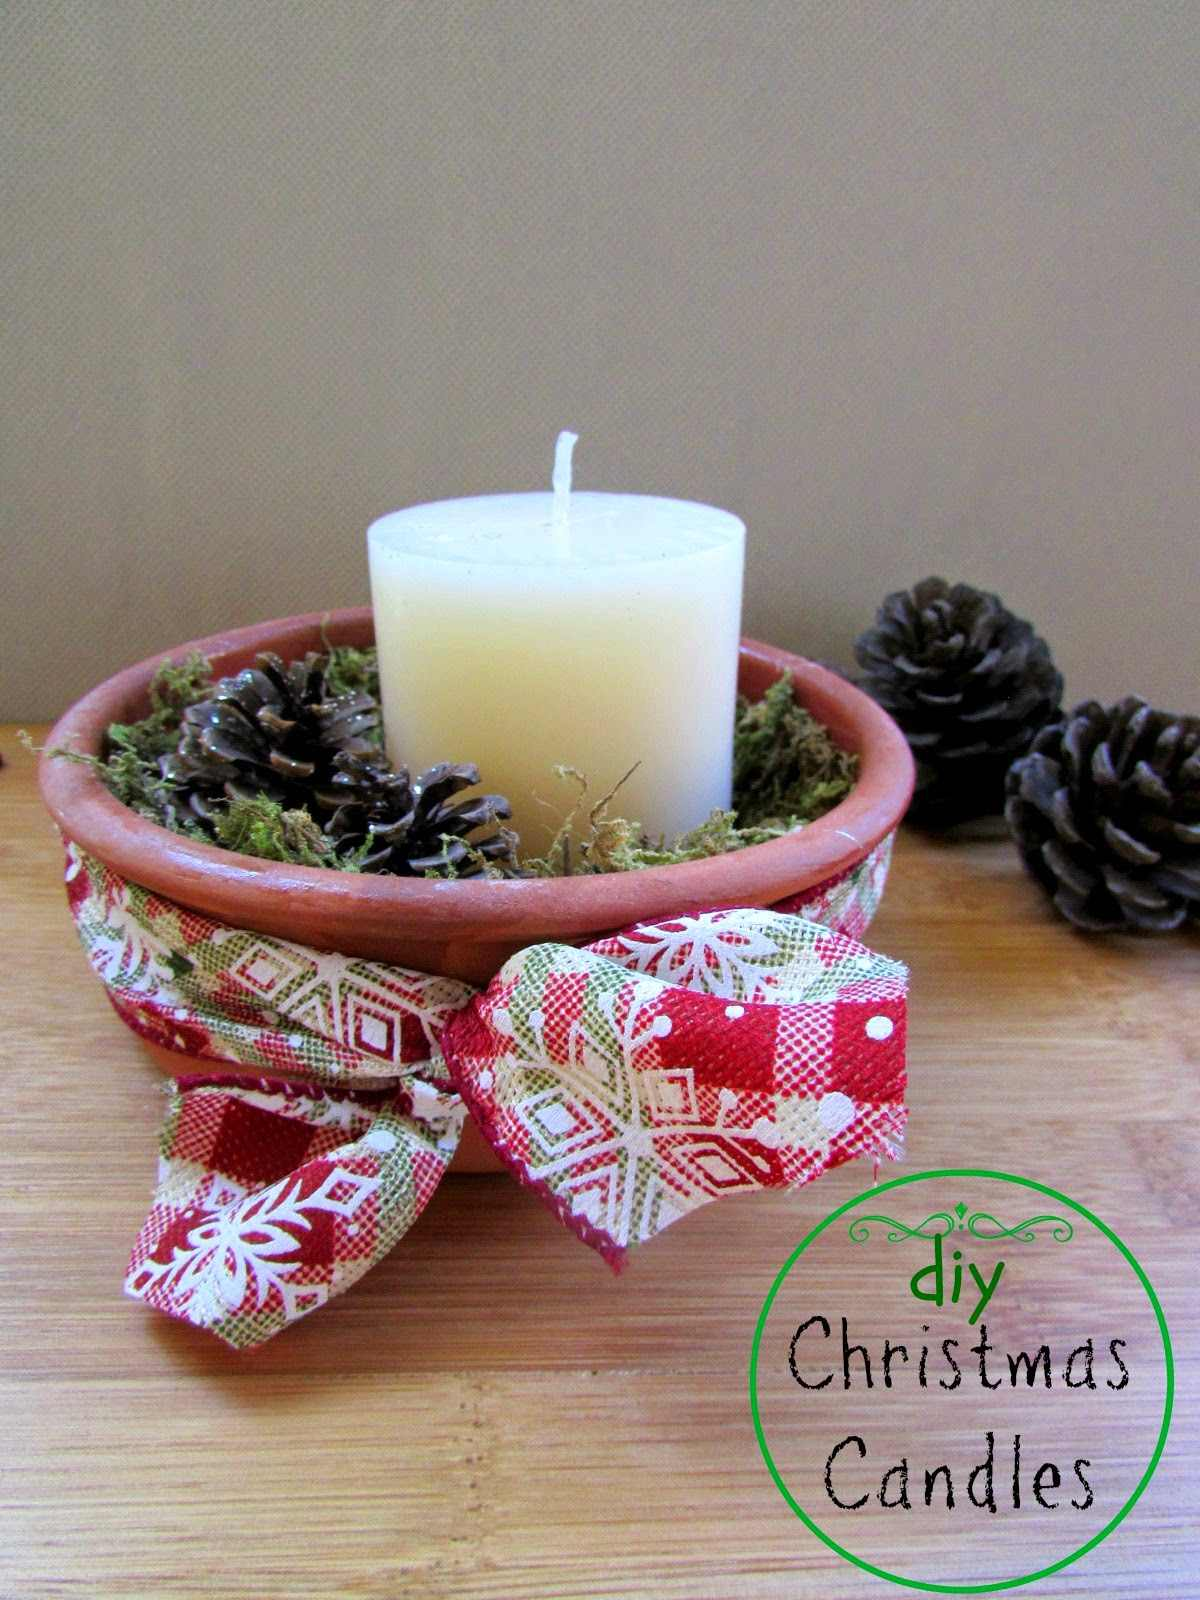 DIY Christmas Woodland Candles